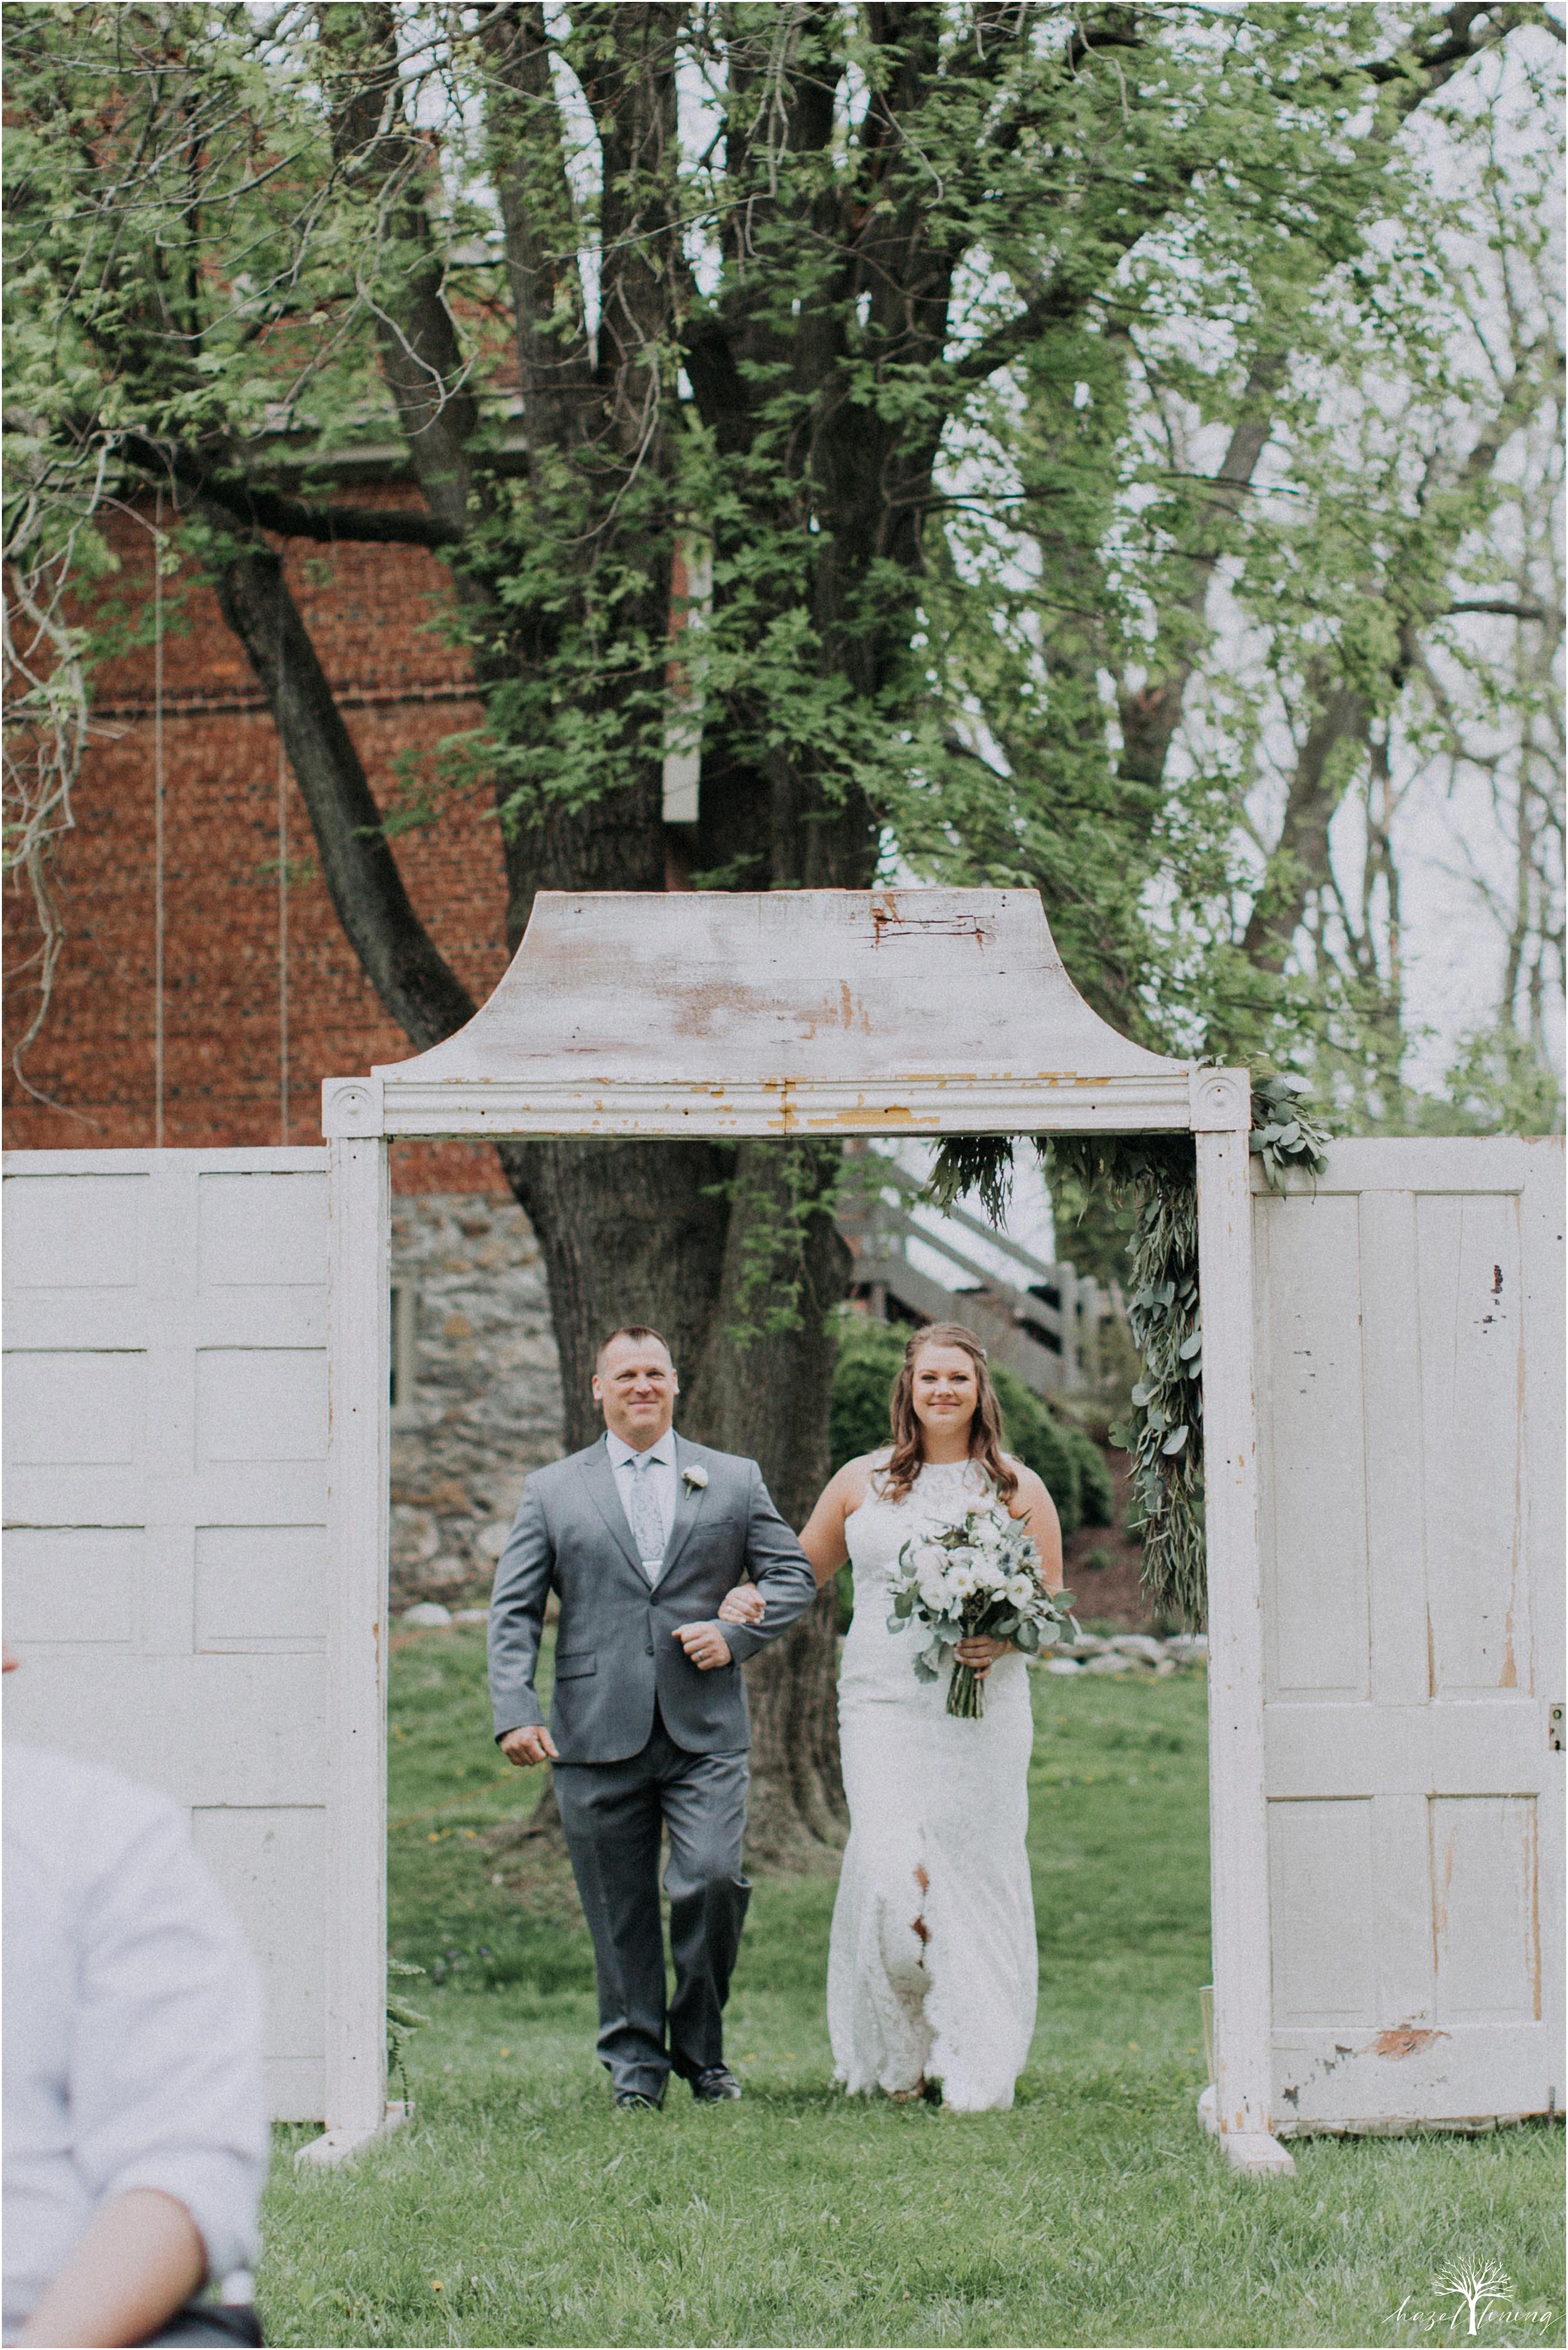 hazel-lining-travel-wedding-elopement-photography-abby-skyler-hunt-the-willis-house-york-pennsylvania-outdoor-estate-wedding_0076.jpg